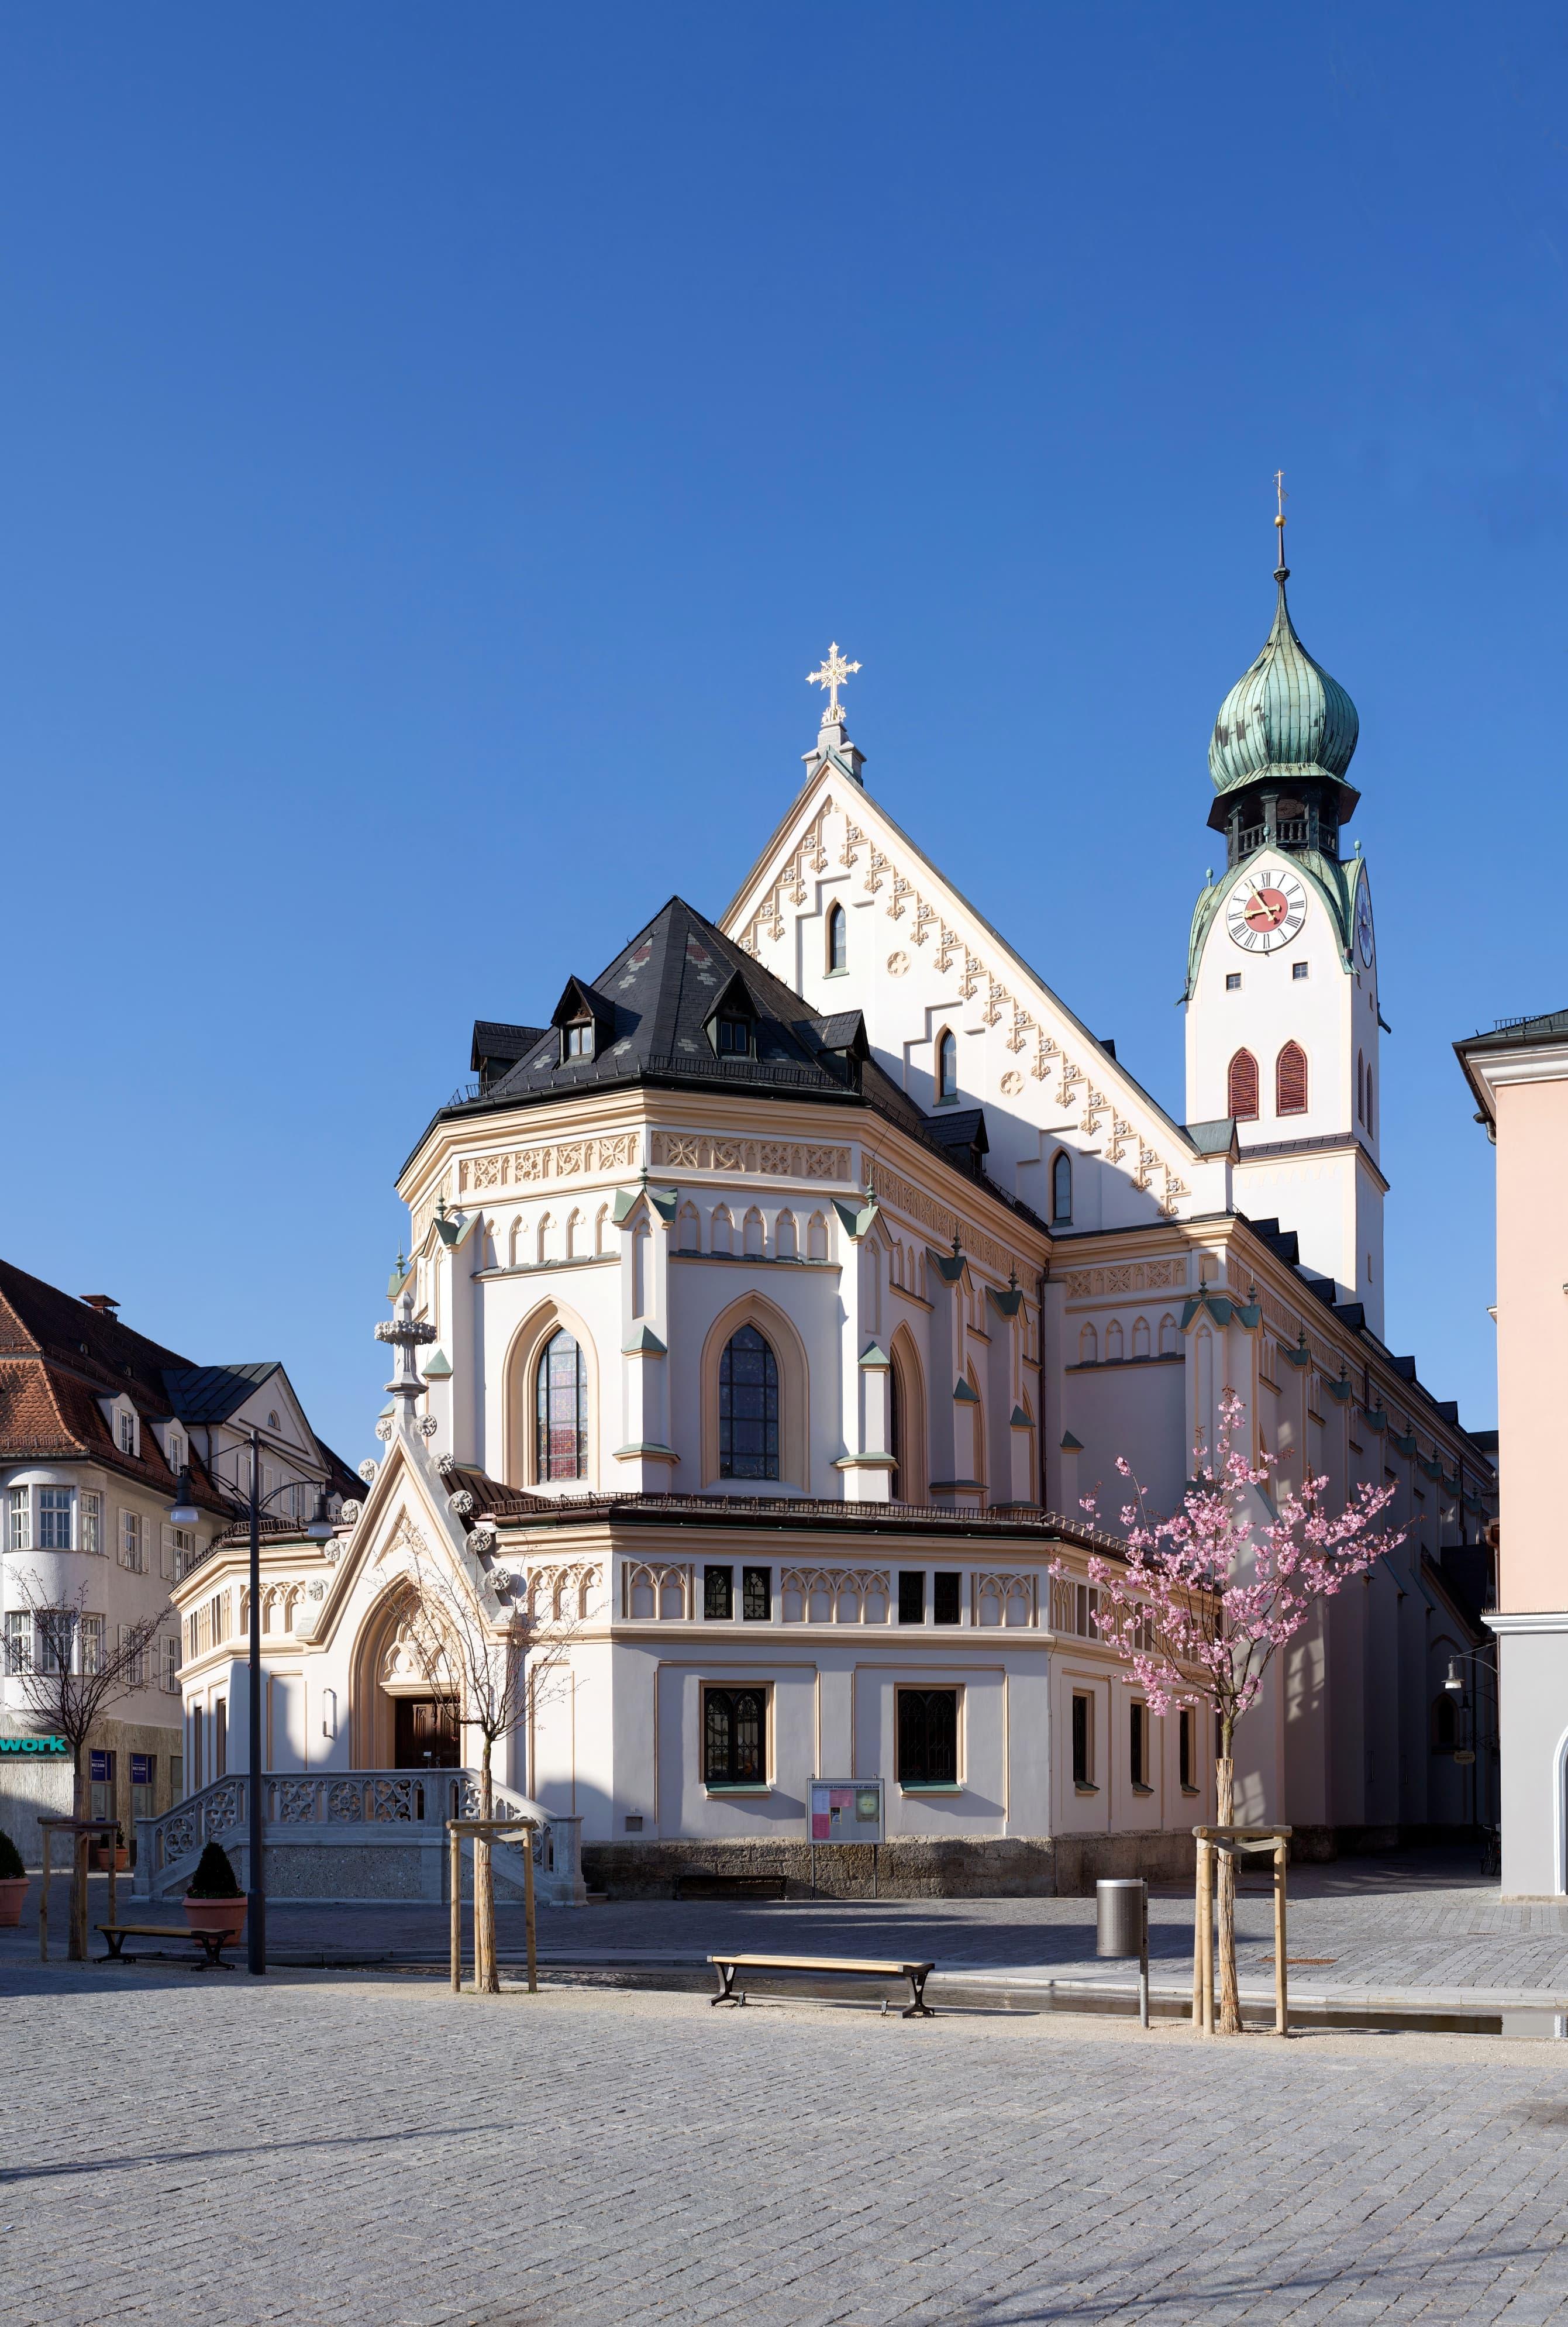 Stadtpfarrkirche St. Nikolaus Rosenheim Aussenansicht